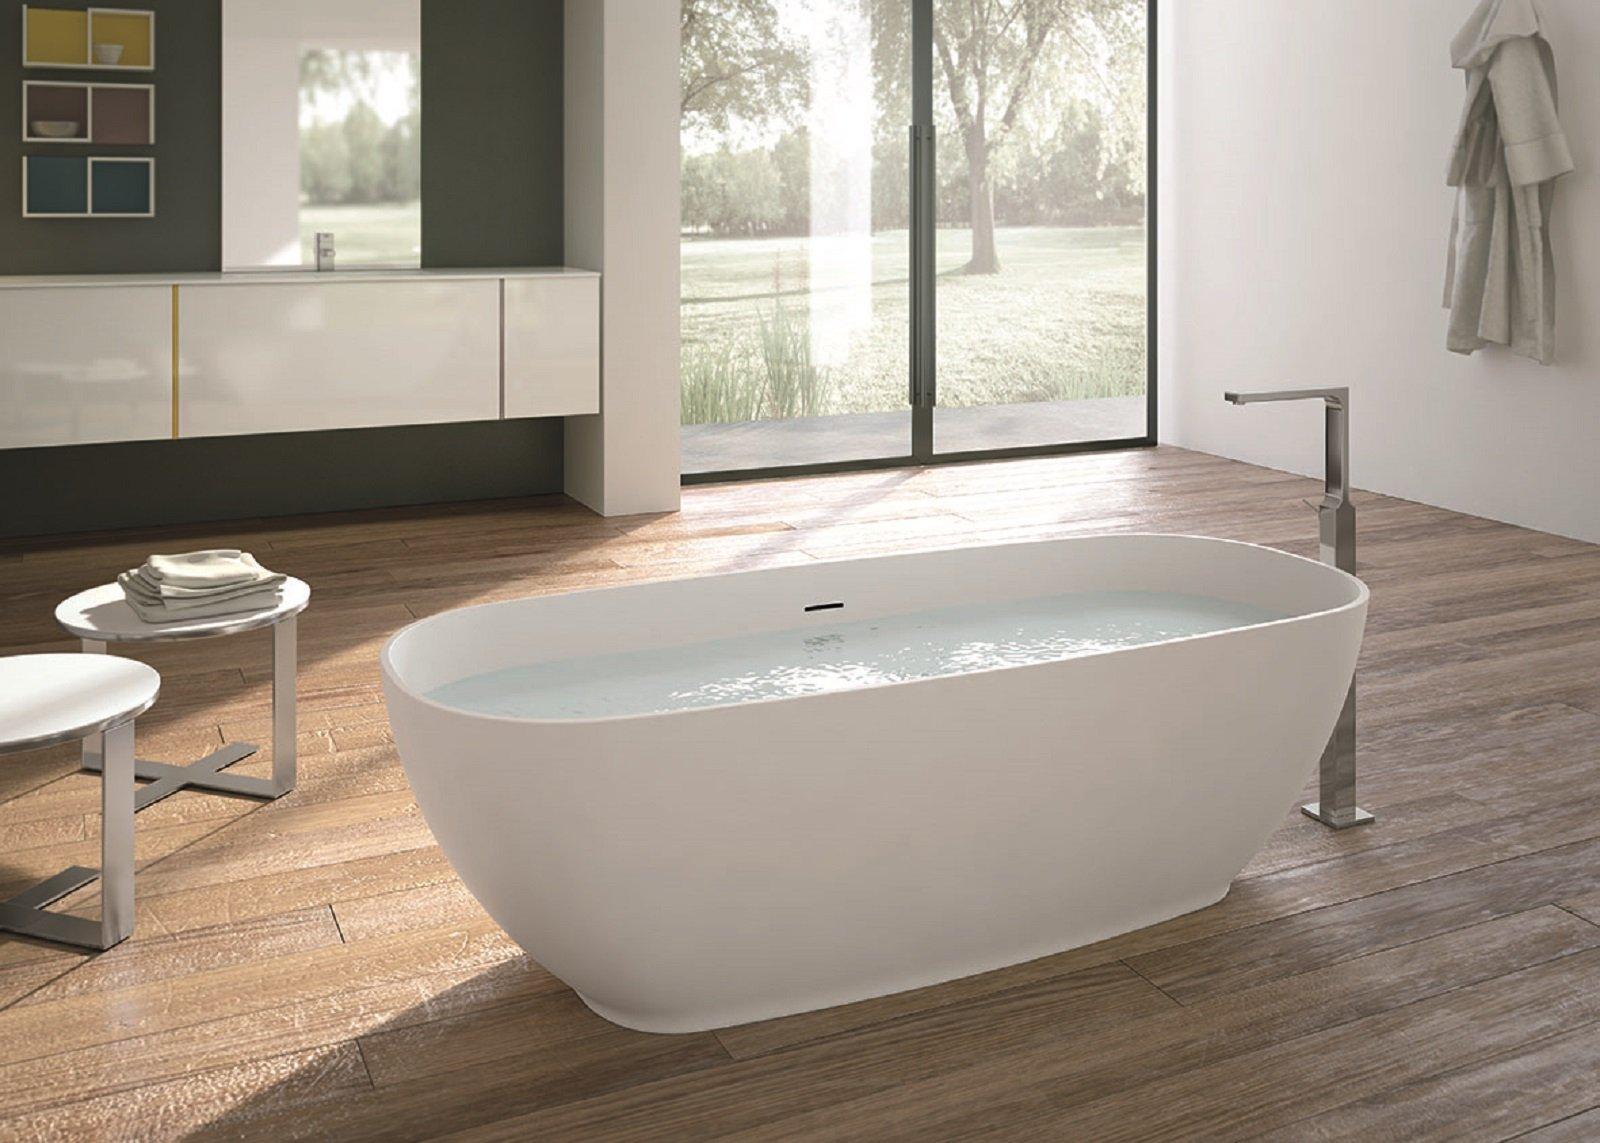 Vasca Da Bagno Hafro Modello Nova : Vasca da bagno piccola cool mobile arredo bagno avon lavabo